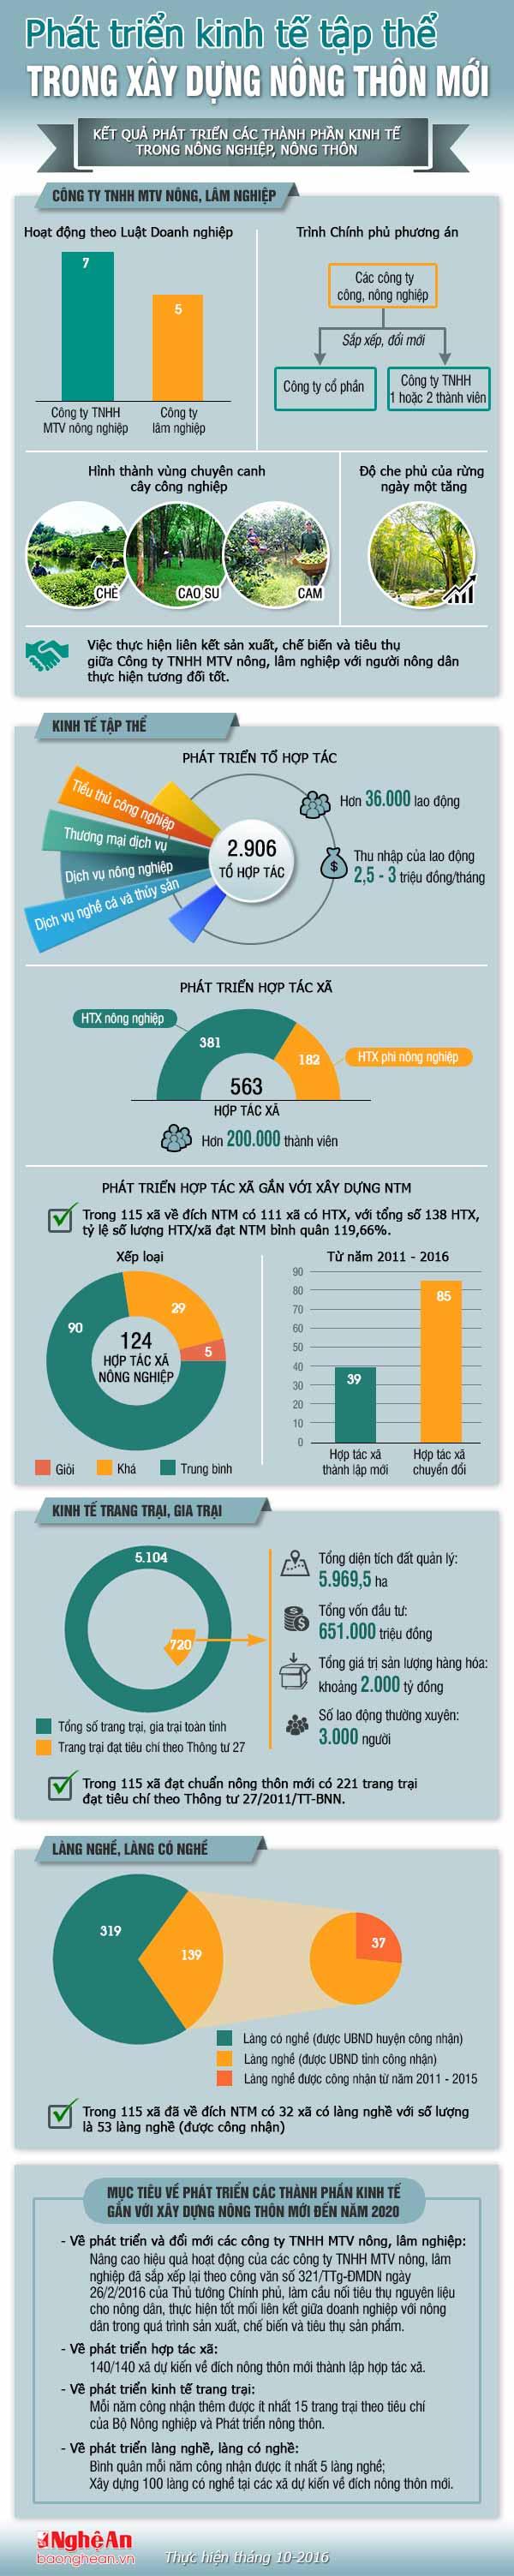 infographics: kinh te tap the trong xay dung ntm o nghe an hinh anh 1